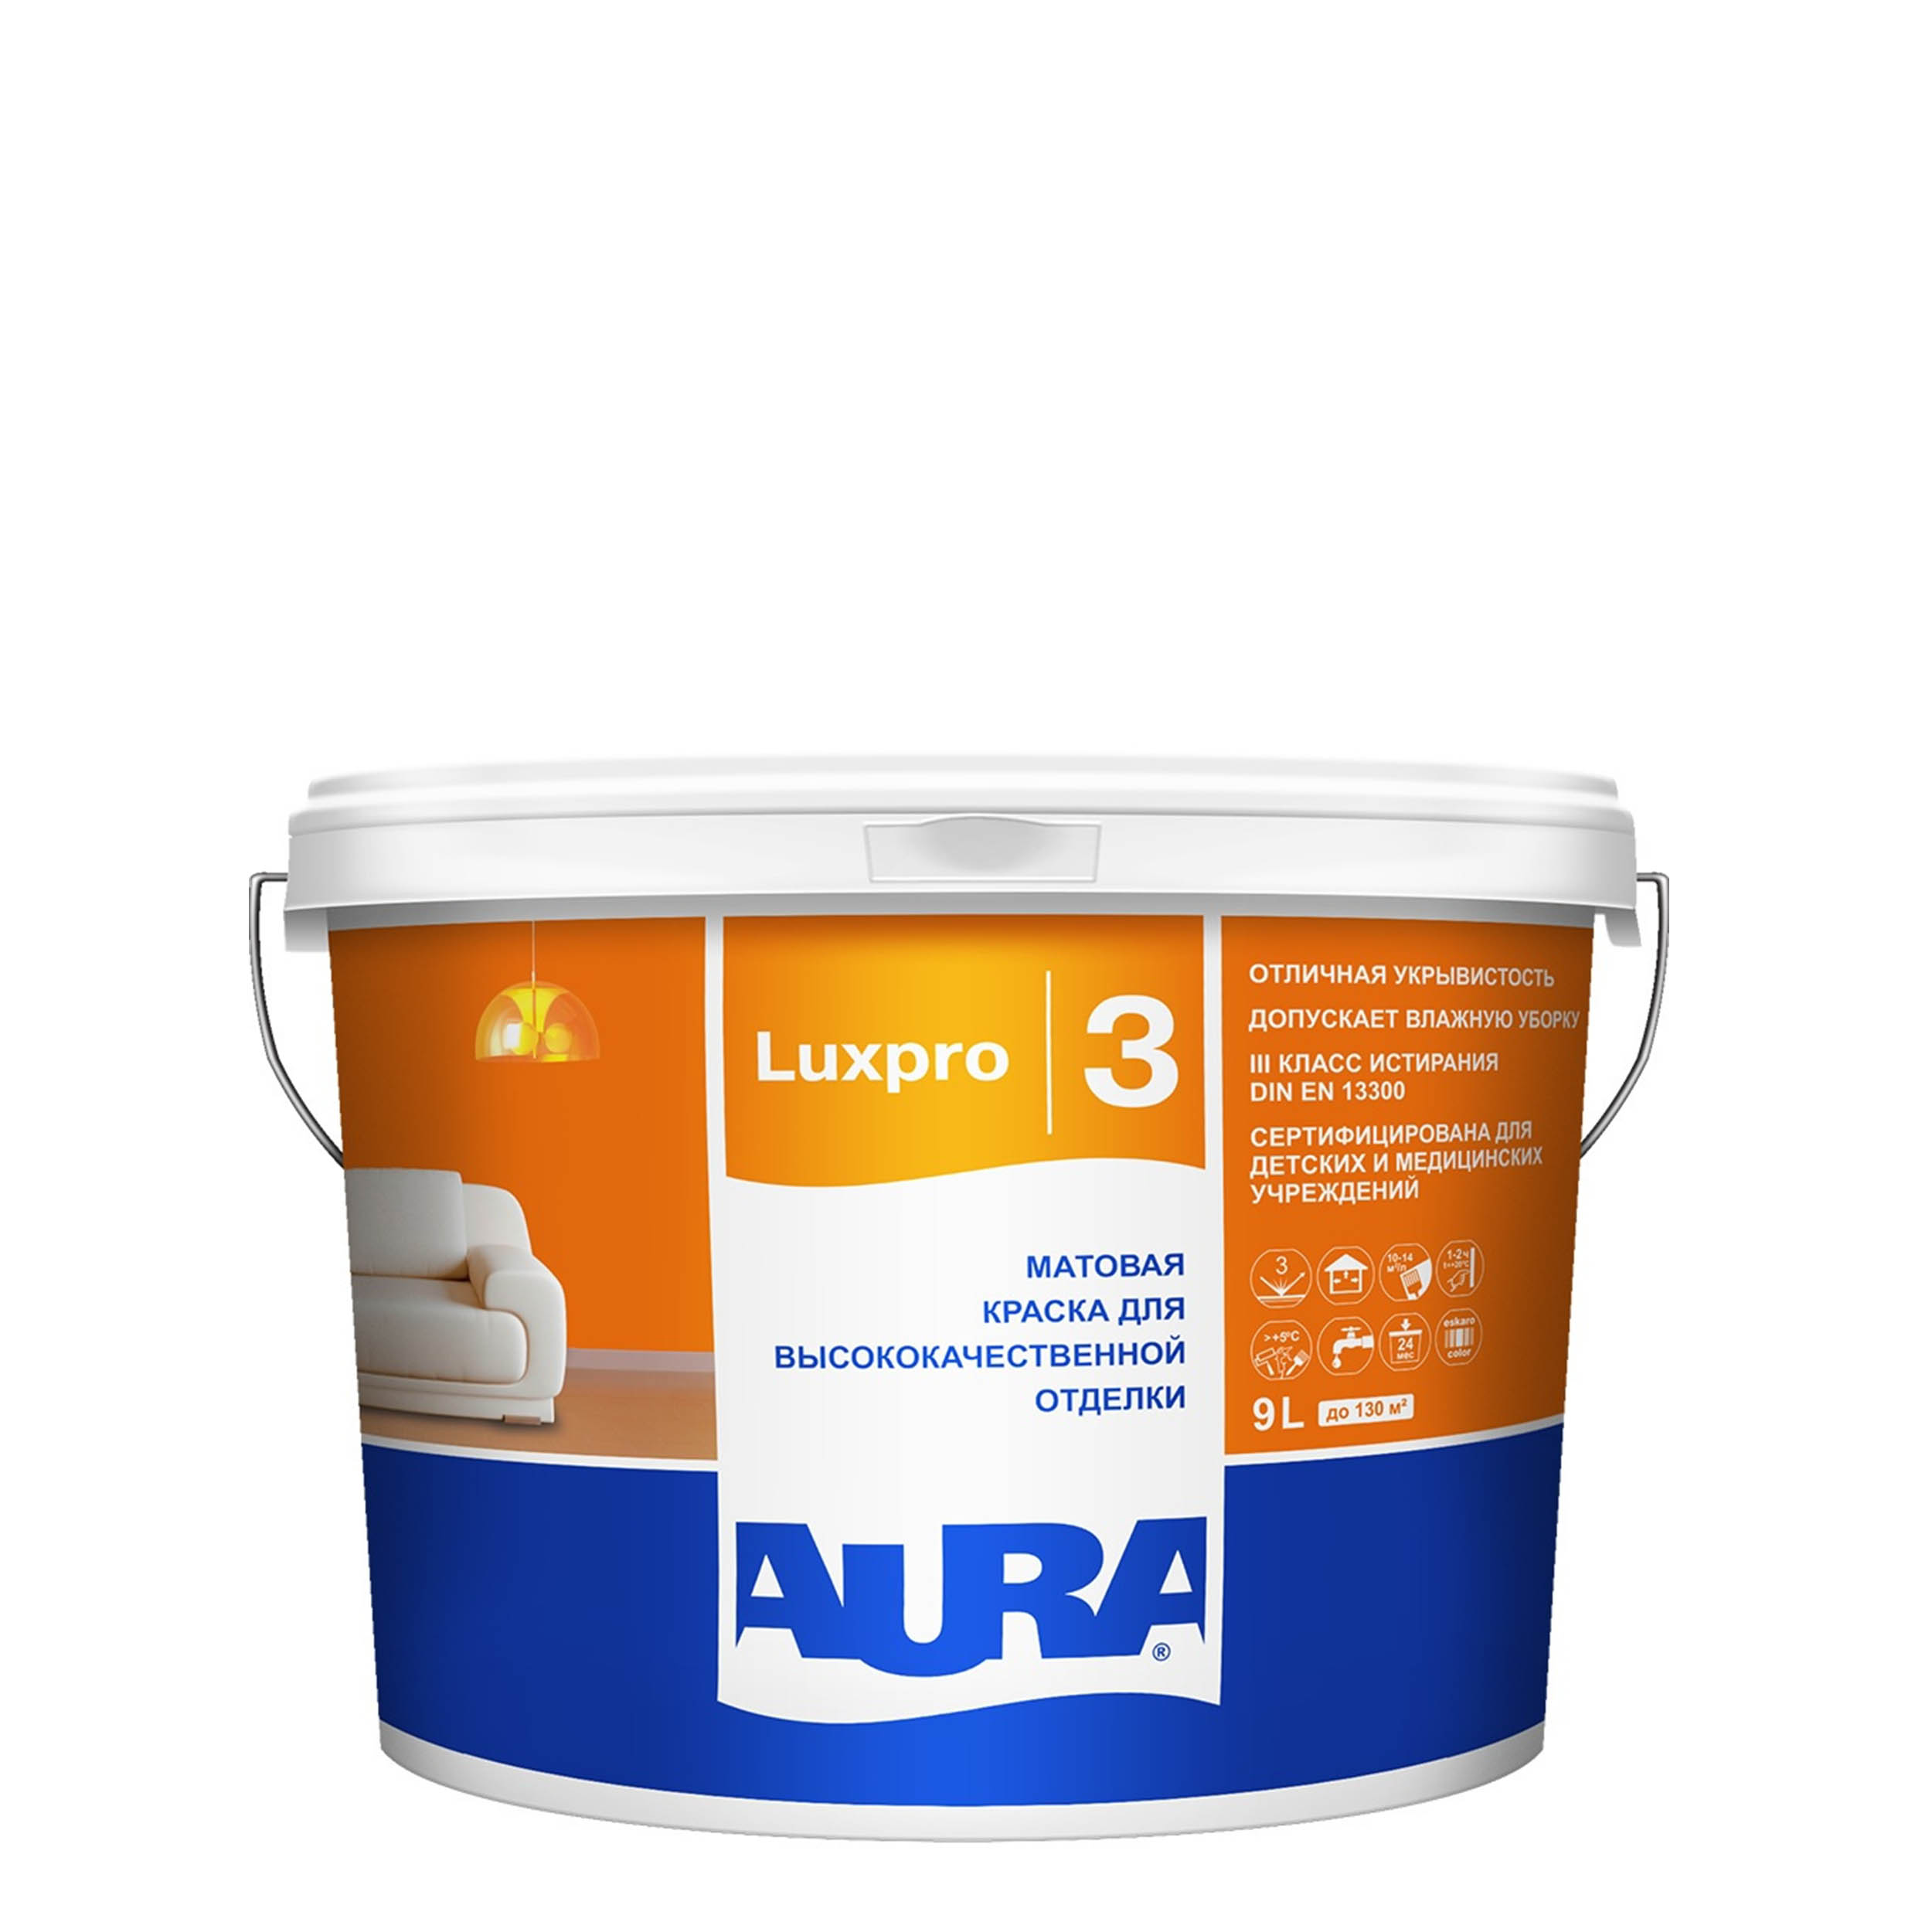 Фото 3 - Краска интерьерная, Aura LuxPRO 3, RAL 5012, 11 кг.